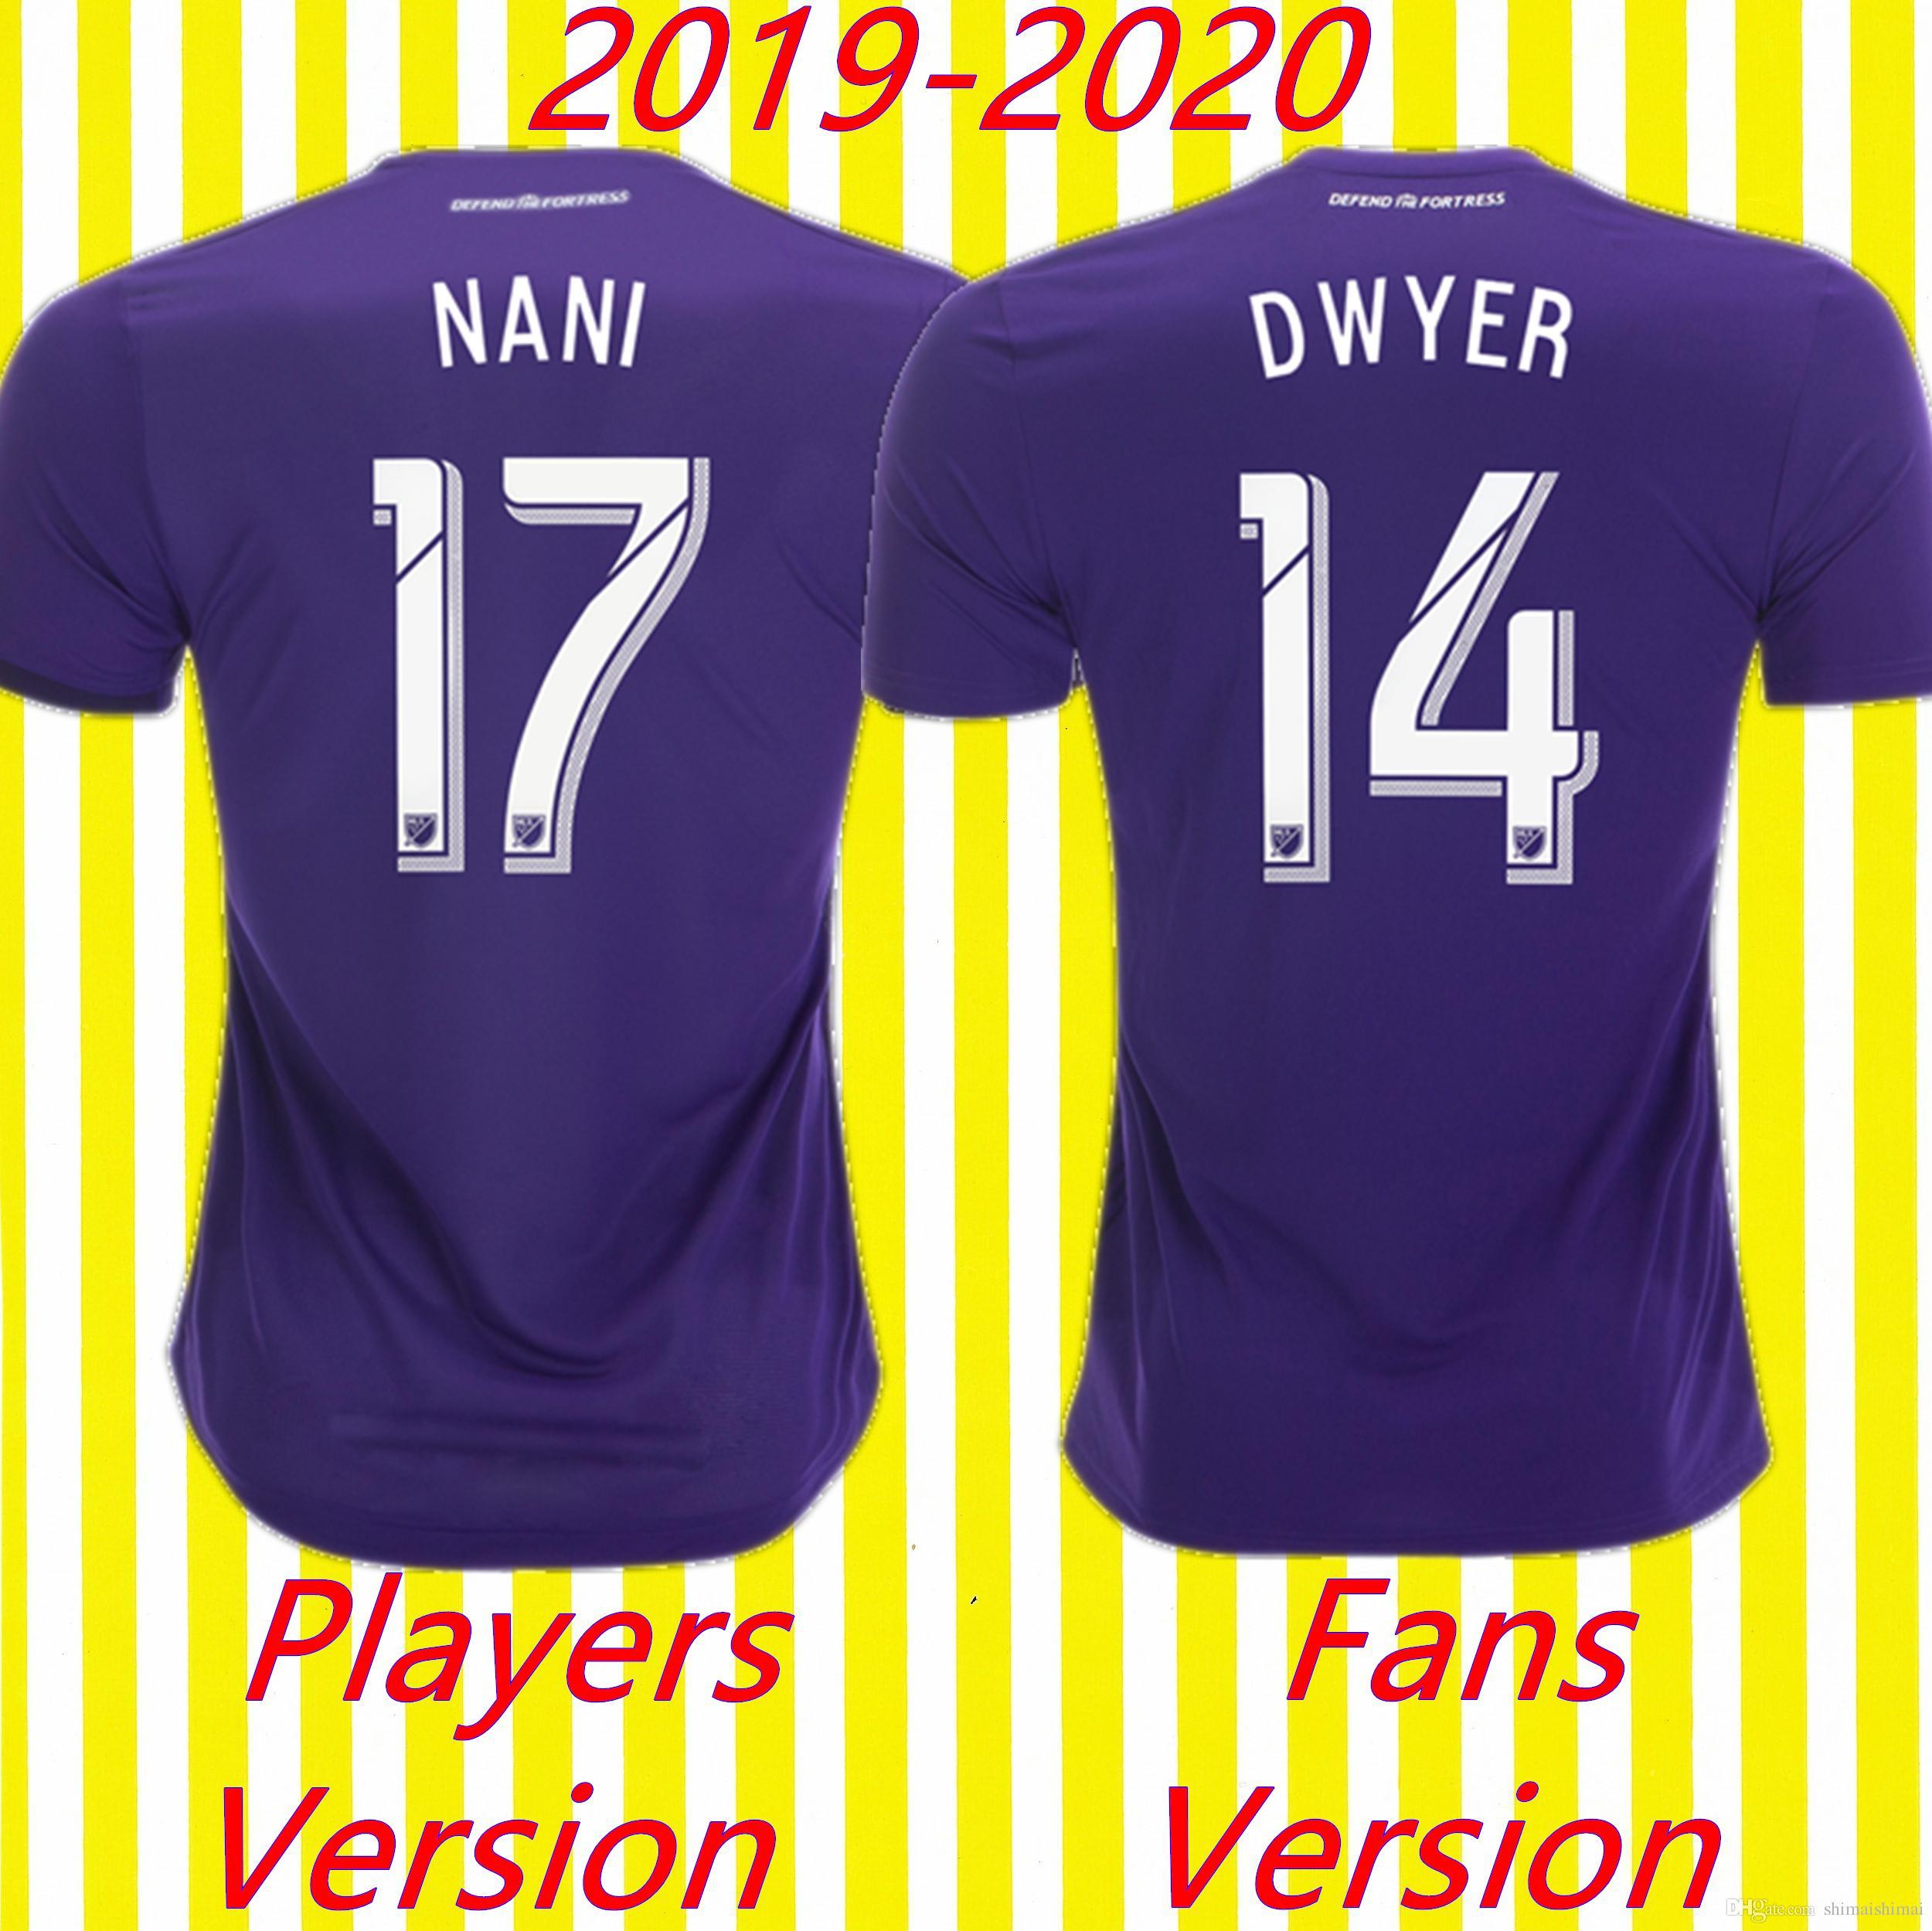 0381ce4273a 2019 MLS Patch Player Version Fans Edition Thai Quality Orlando Soccer  Jersey City 19 20 Football Kit Shirt 2019 2020 Futbol Club NANI DWYER From  ...